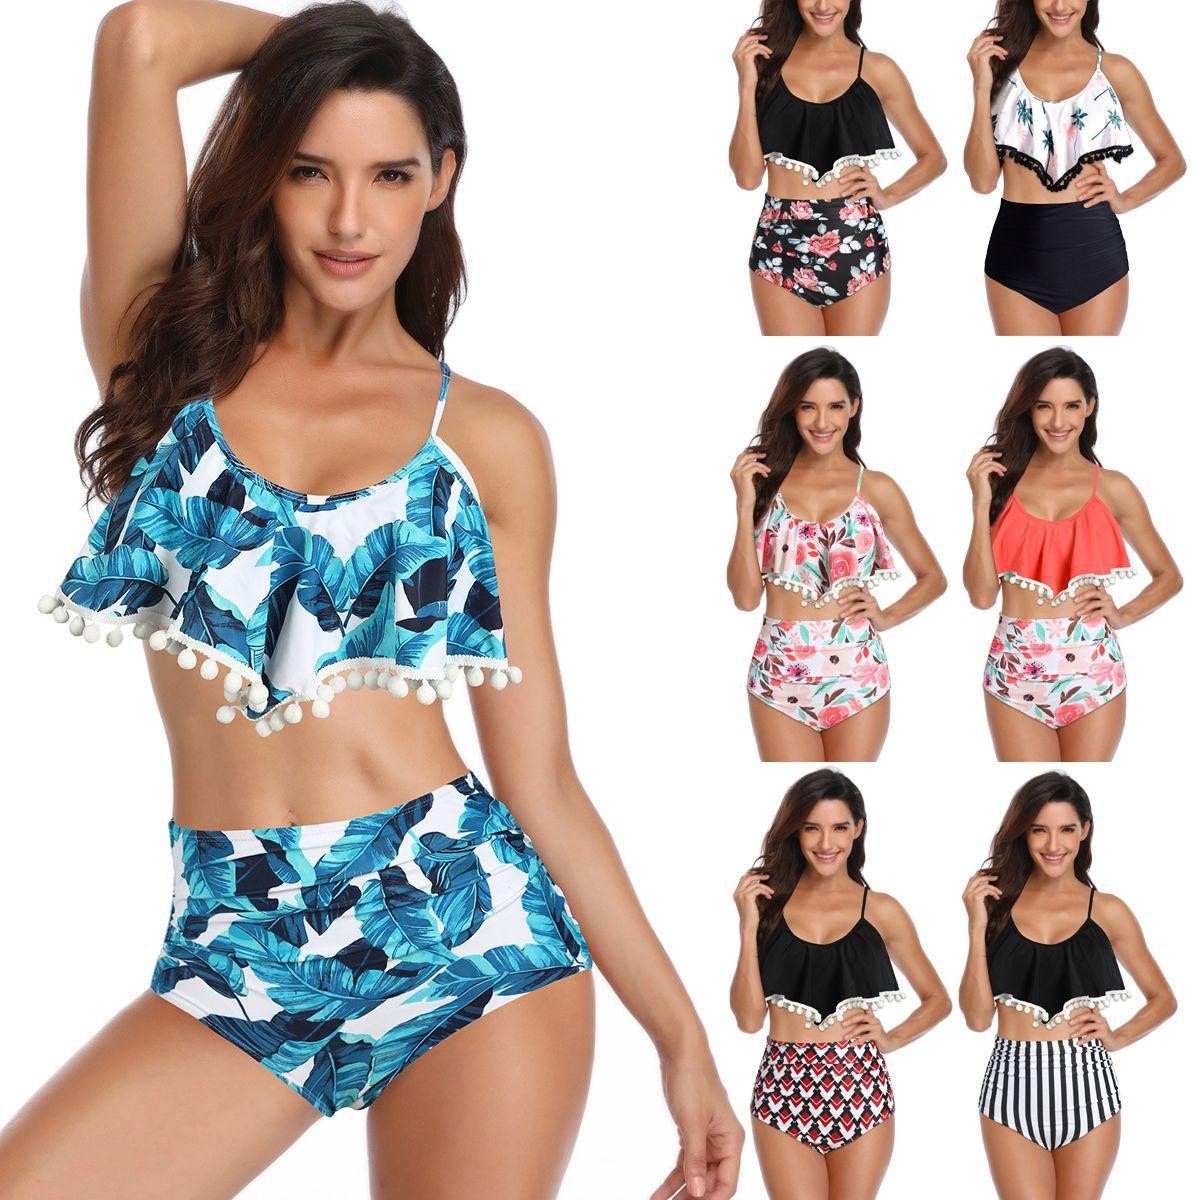 Lotus leaf lace ball high waist coconut tree printed lady bikini women swimsuit summer hot sale